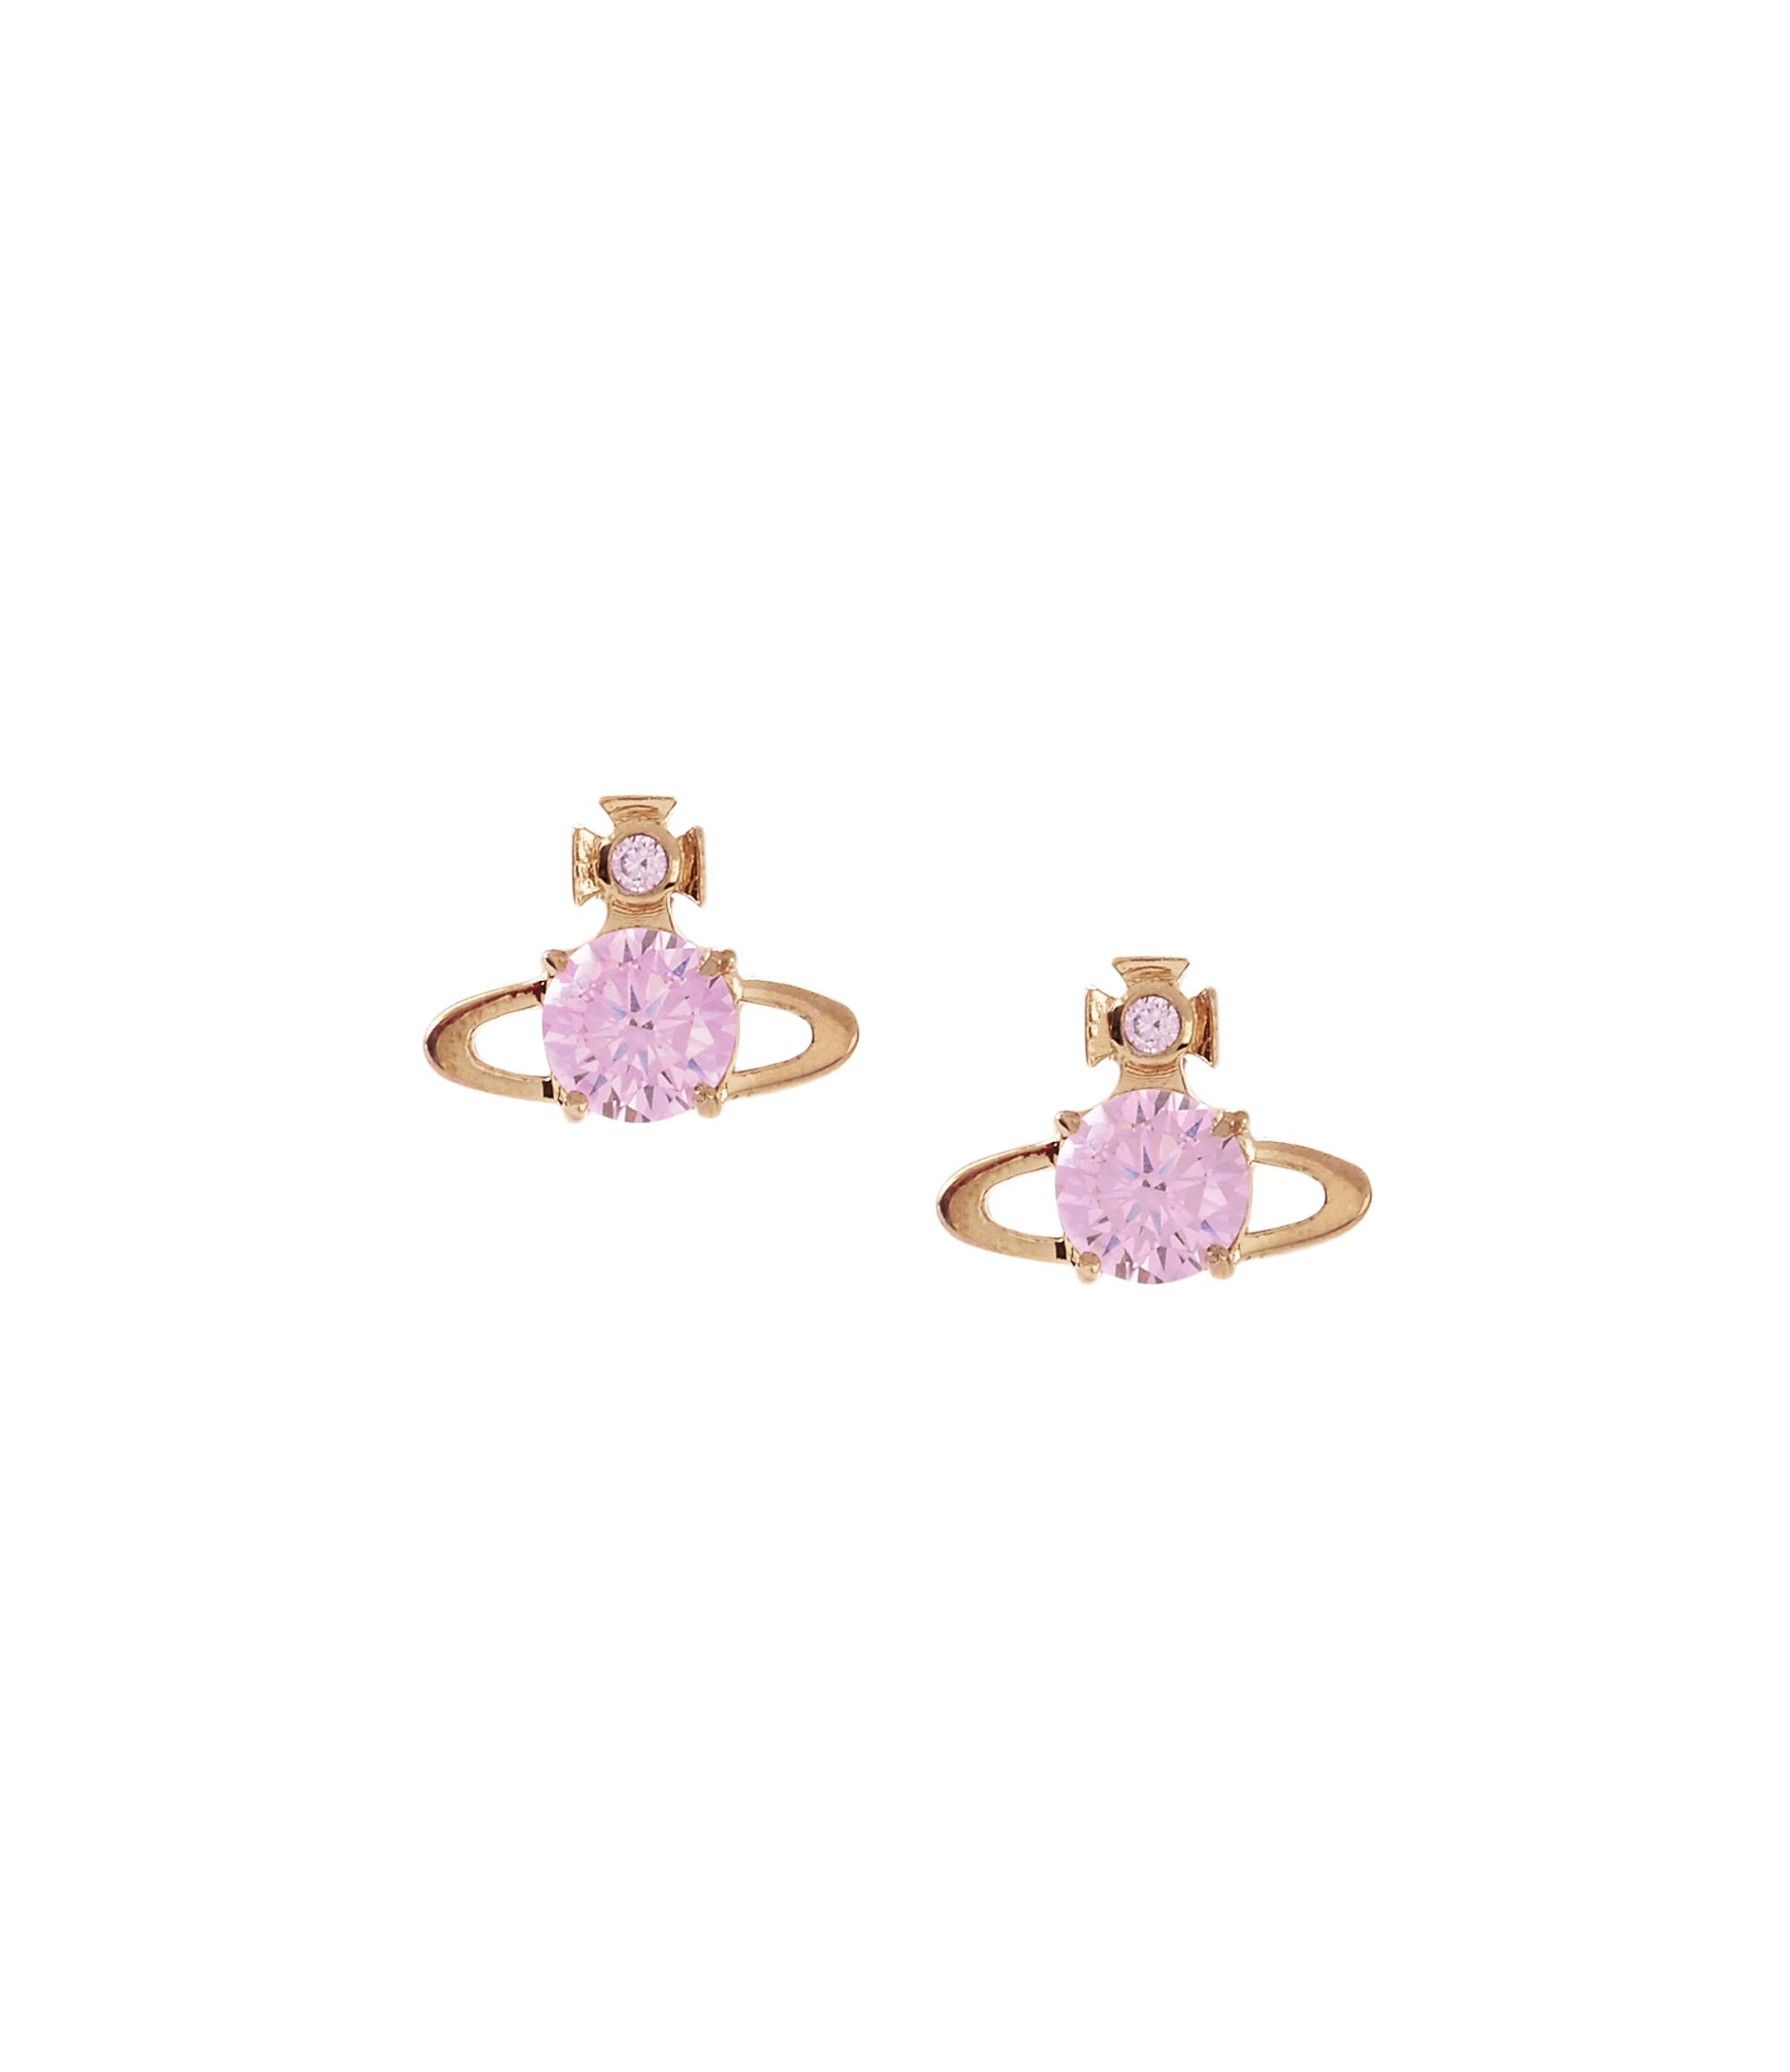 ec67ce5c97f82 Vivienne Westwood Reina Earrings Pink Gold in Pink Cubic Zirconia